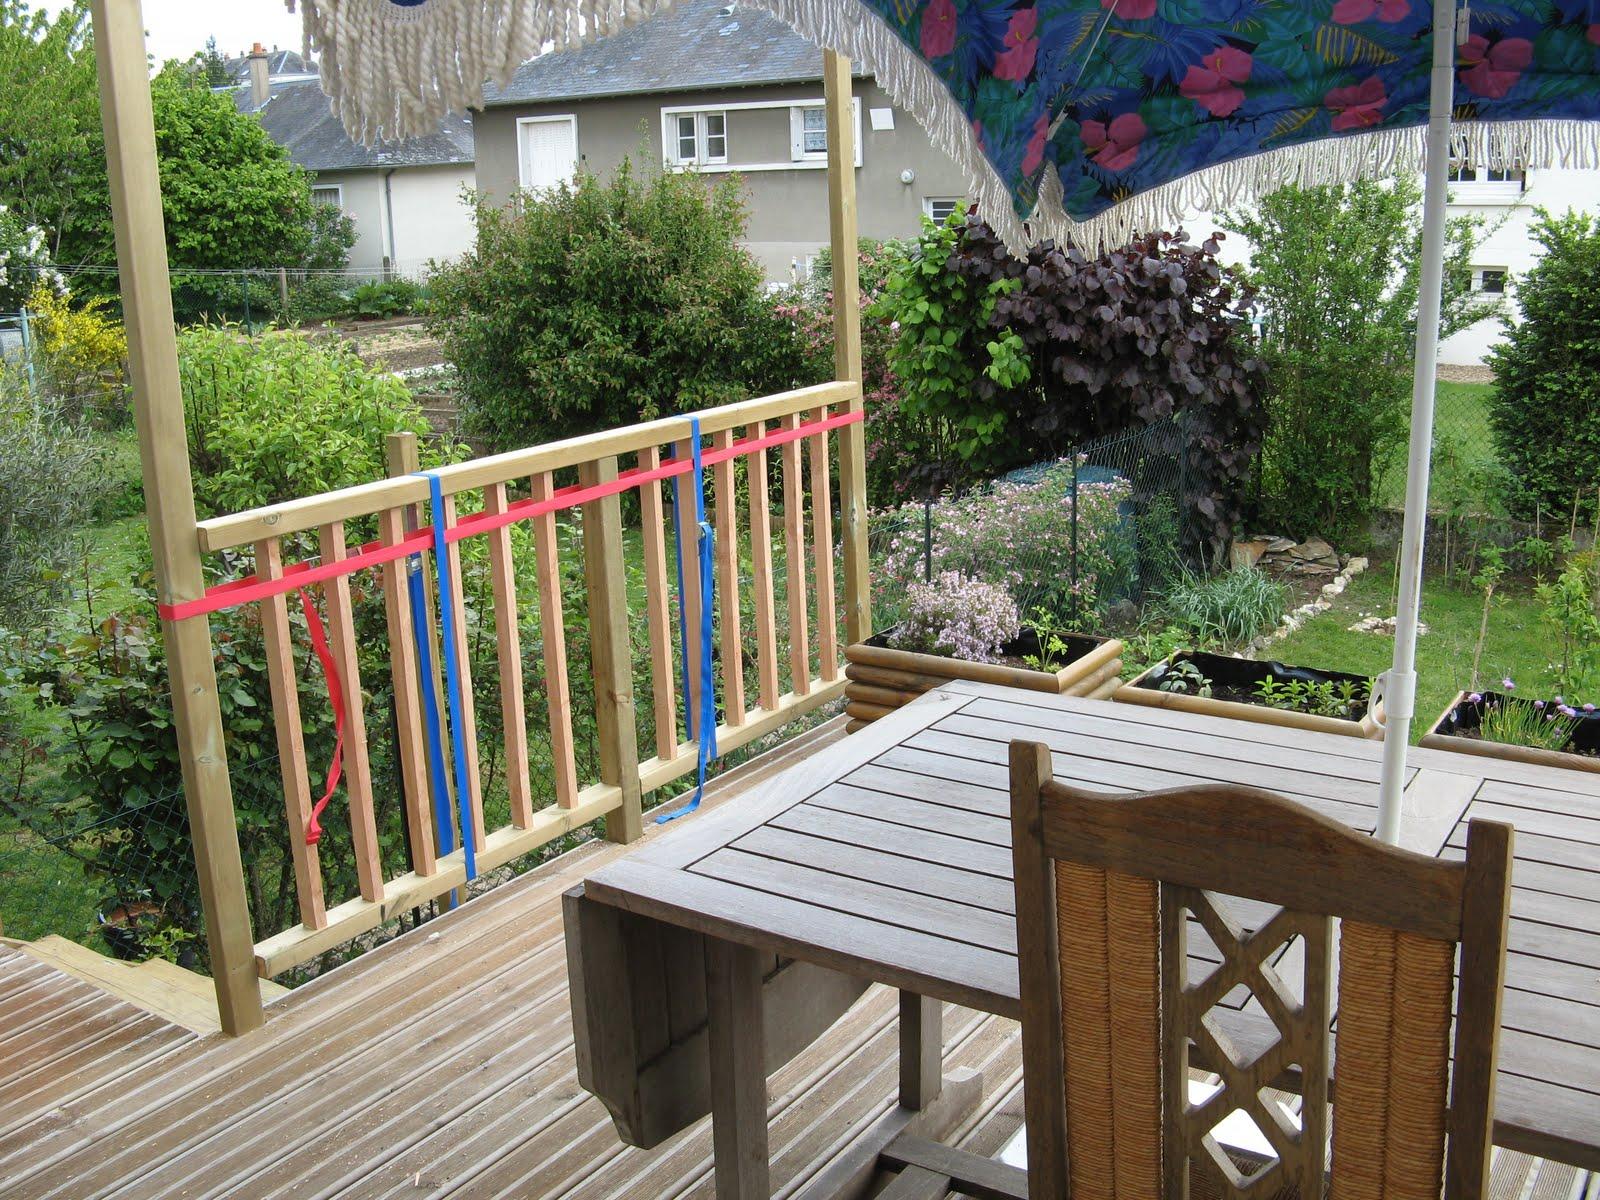 le blog d 39 elodie rambarde terrasse. Black Bedroom Furniture Sets. Home Design Ideas